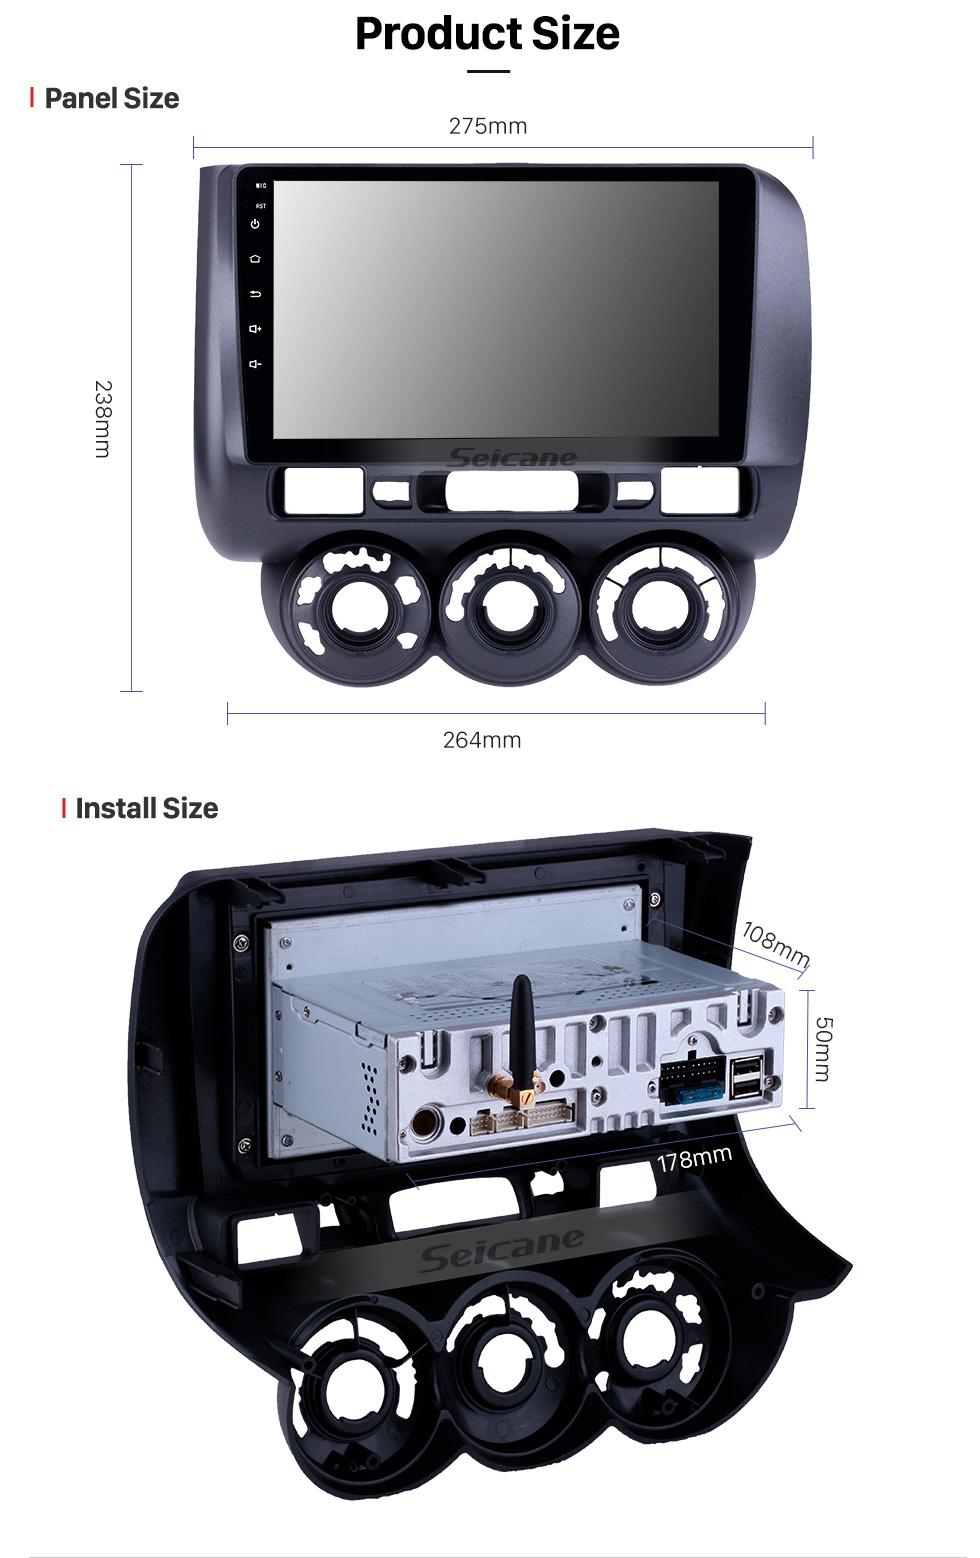 Seicane 2002-2008 Honda Jazz Manual AC Android 9.0 9 inch GPS Navigation Radio Bluetooth HD Touchscreen Carplay support Digital TV